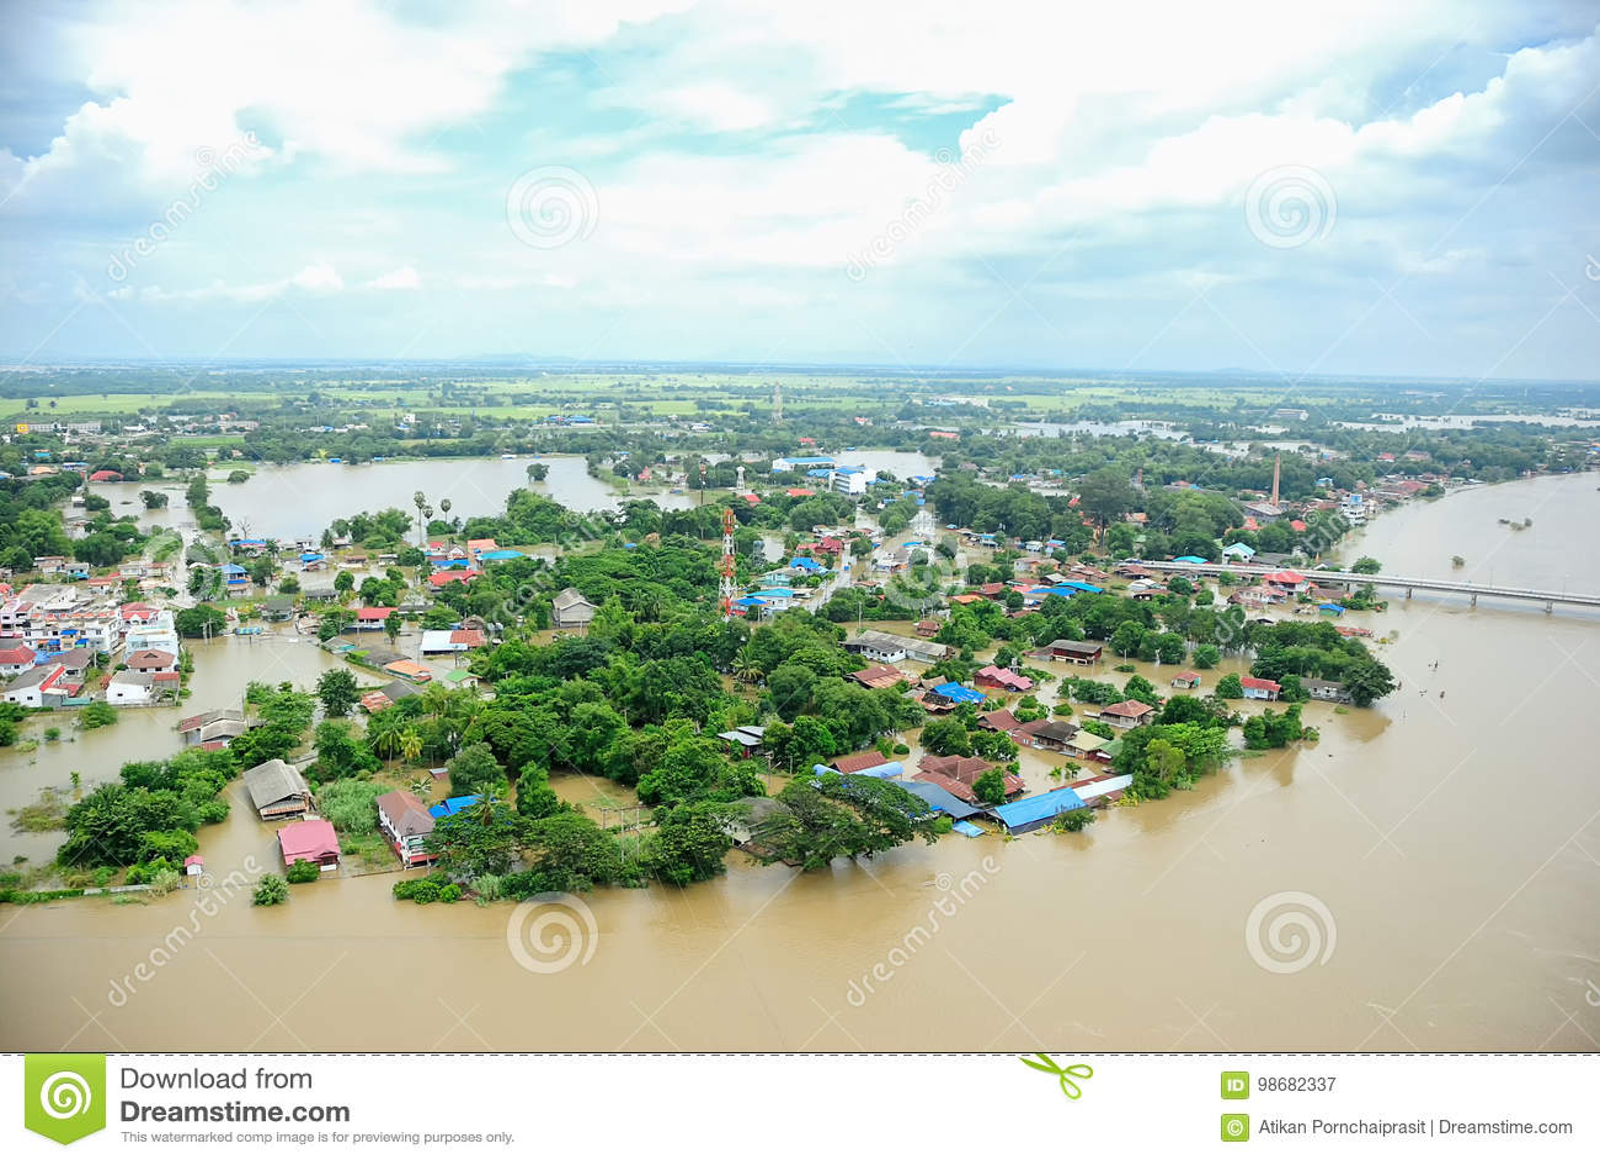 Thailand floods, Natural Disaster